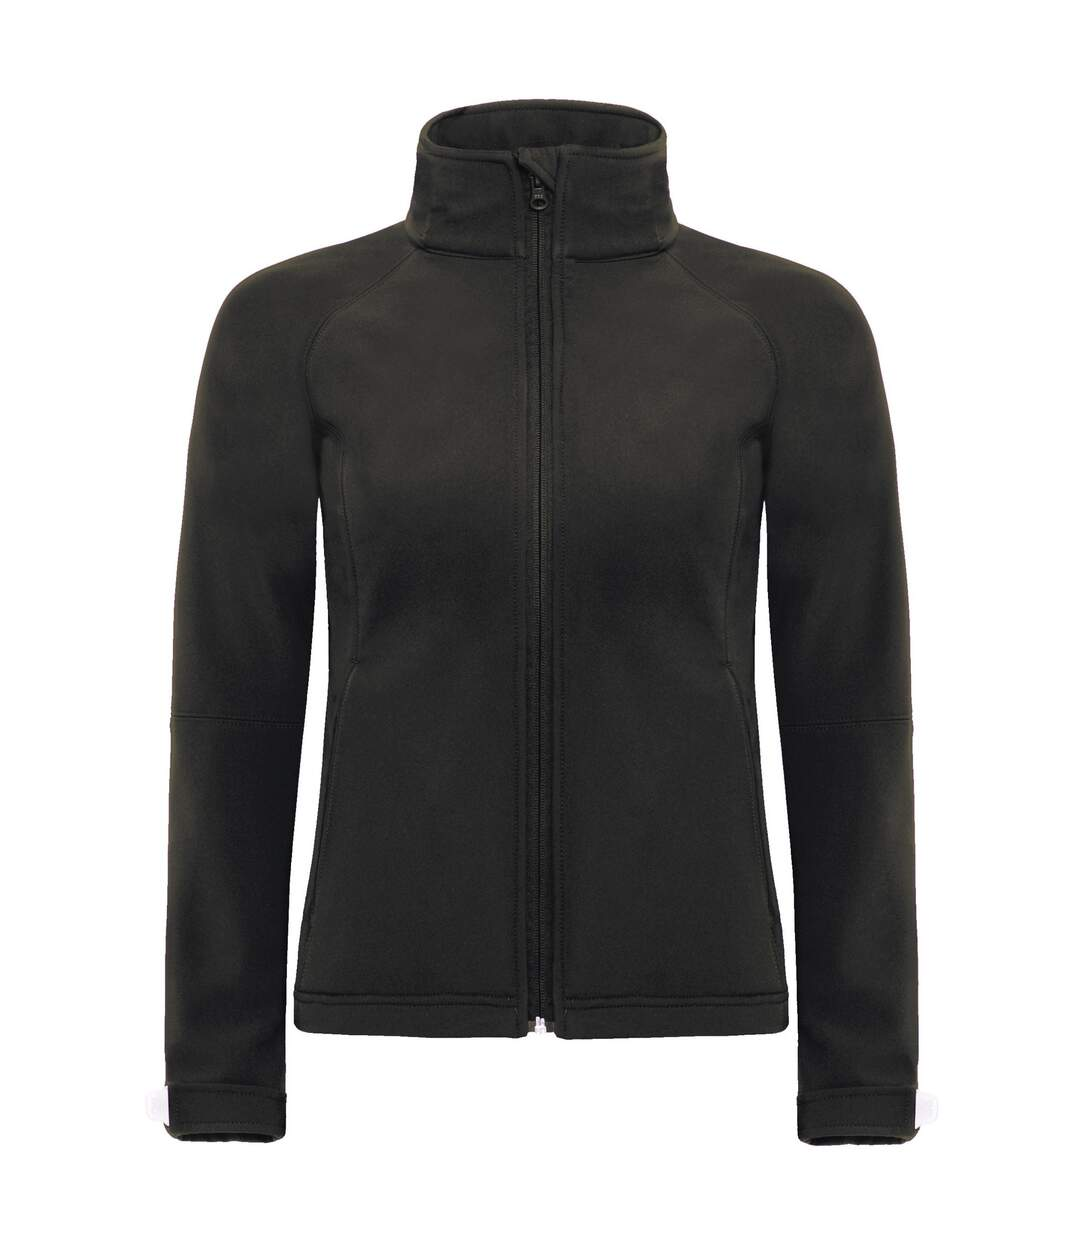 B&C Womens Hooded Premium Softshell Jacket (Windproof, Waterproof & Breathable) (Black) - UTBC2004